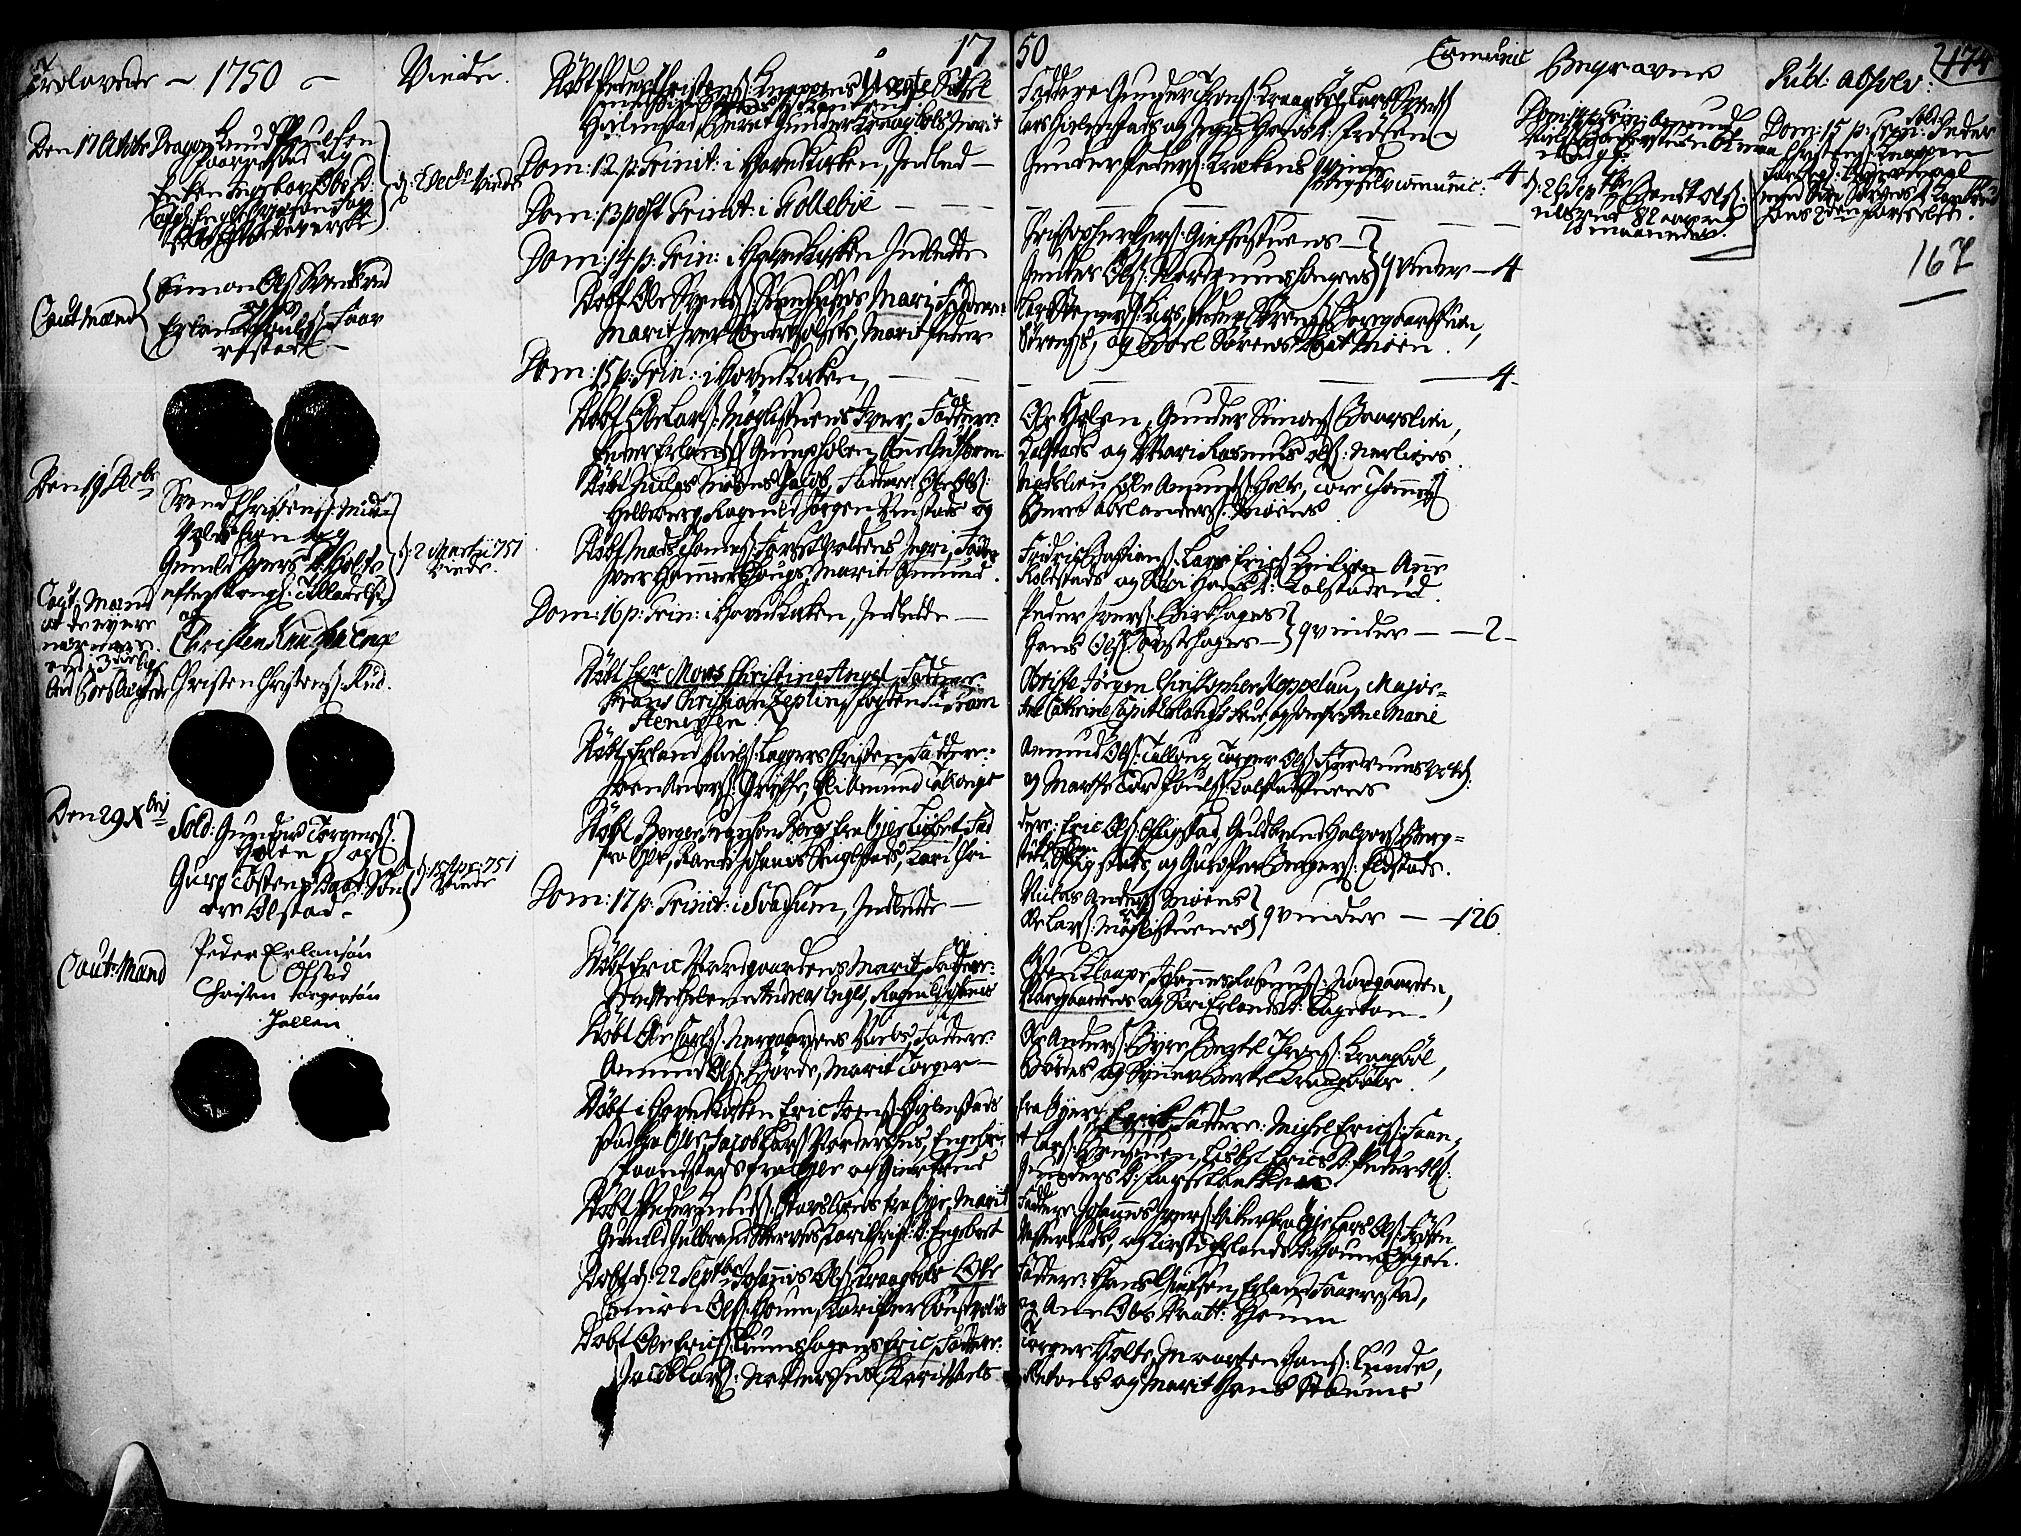 SAH, Gausdal prestekontor, Ministerialbok nr. 2, 1729-1757, s. 167